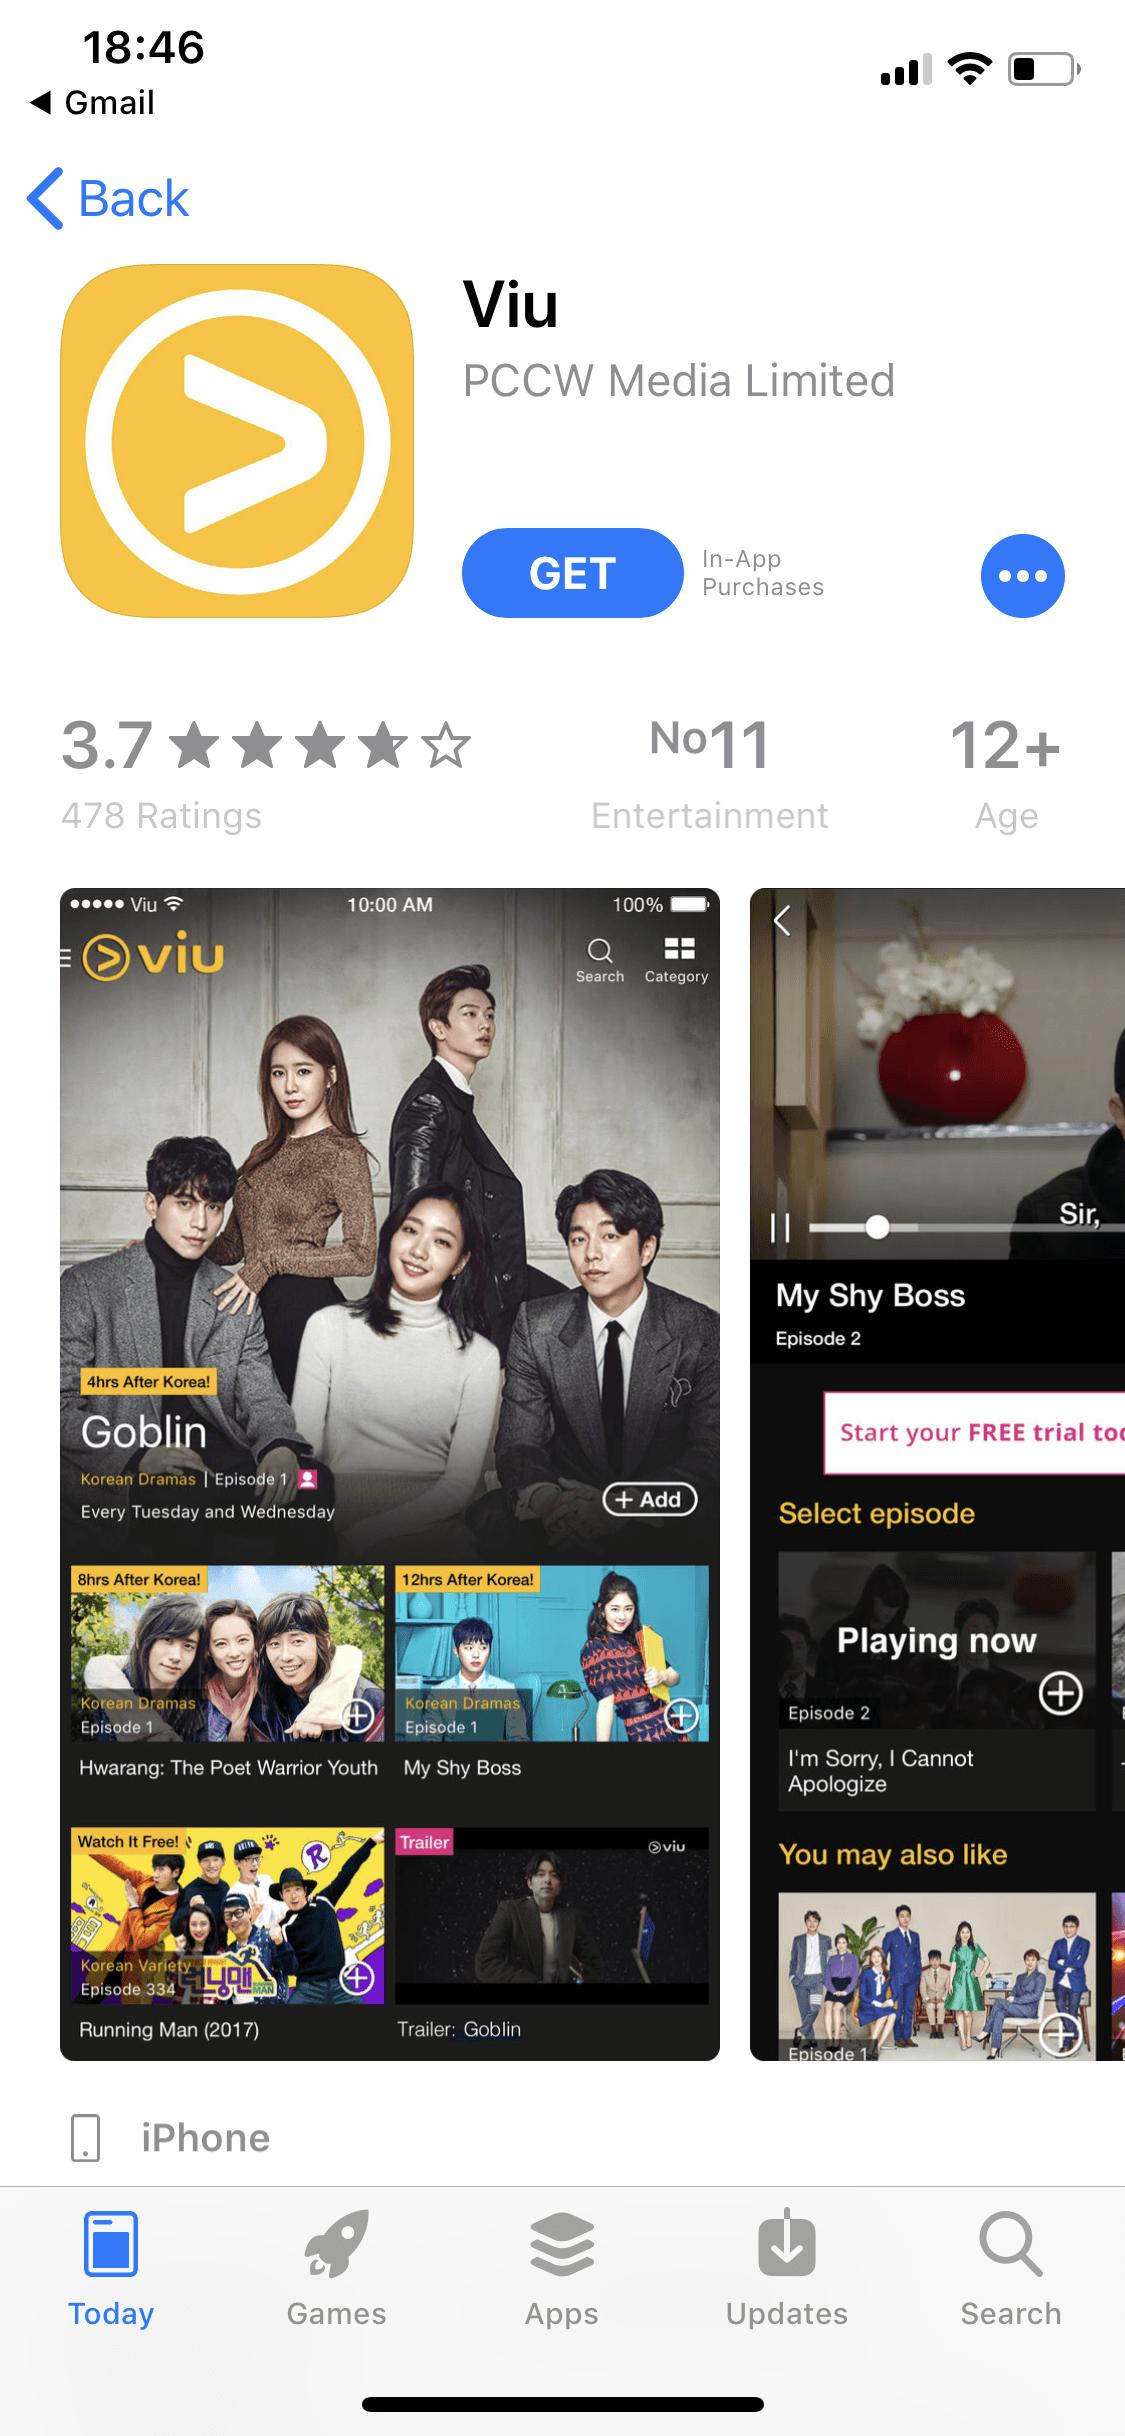 Cny 2018 App 4